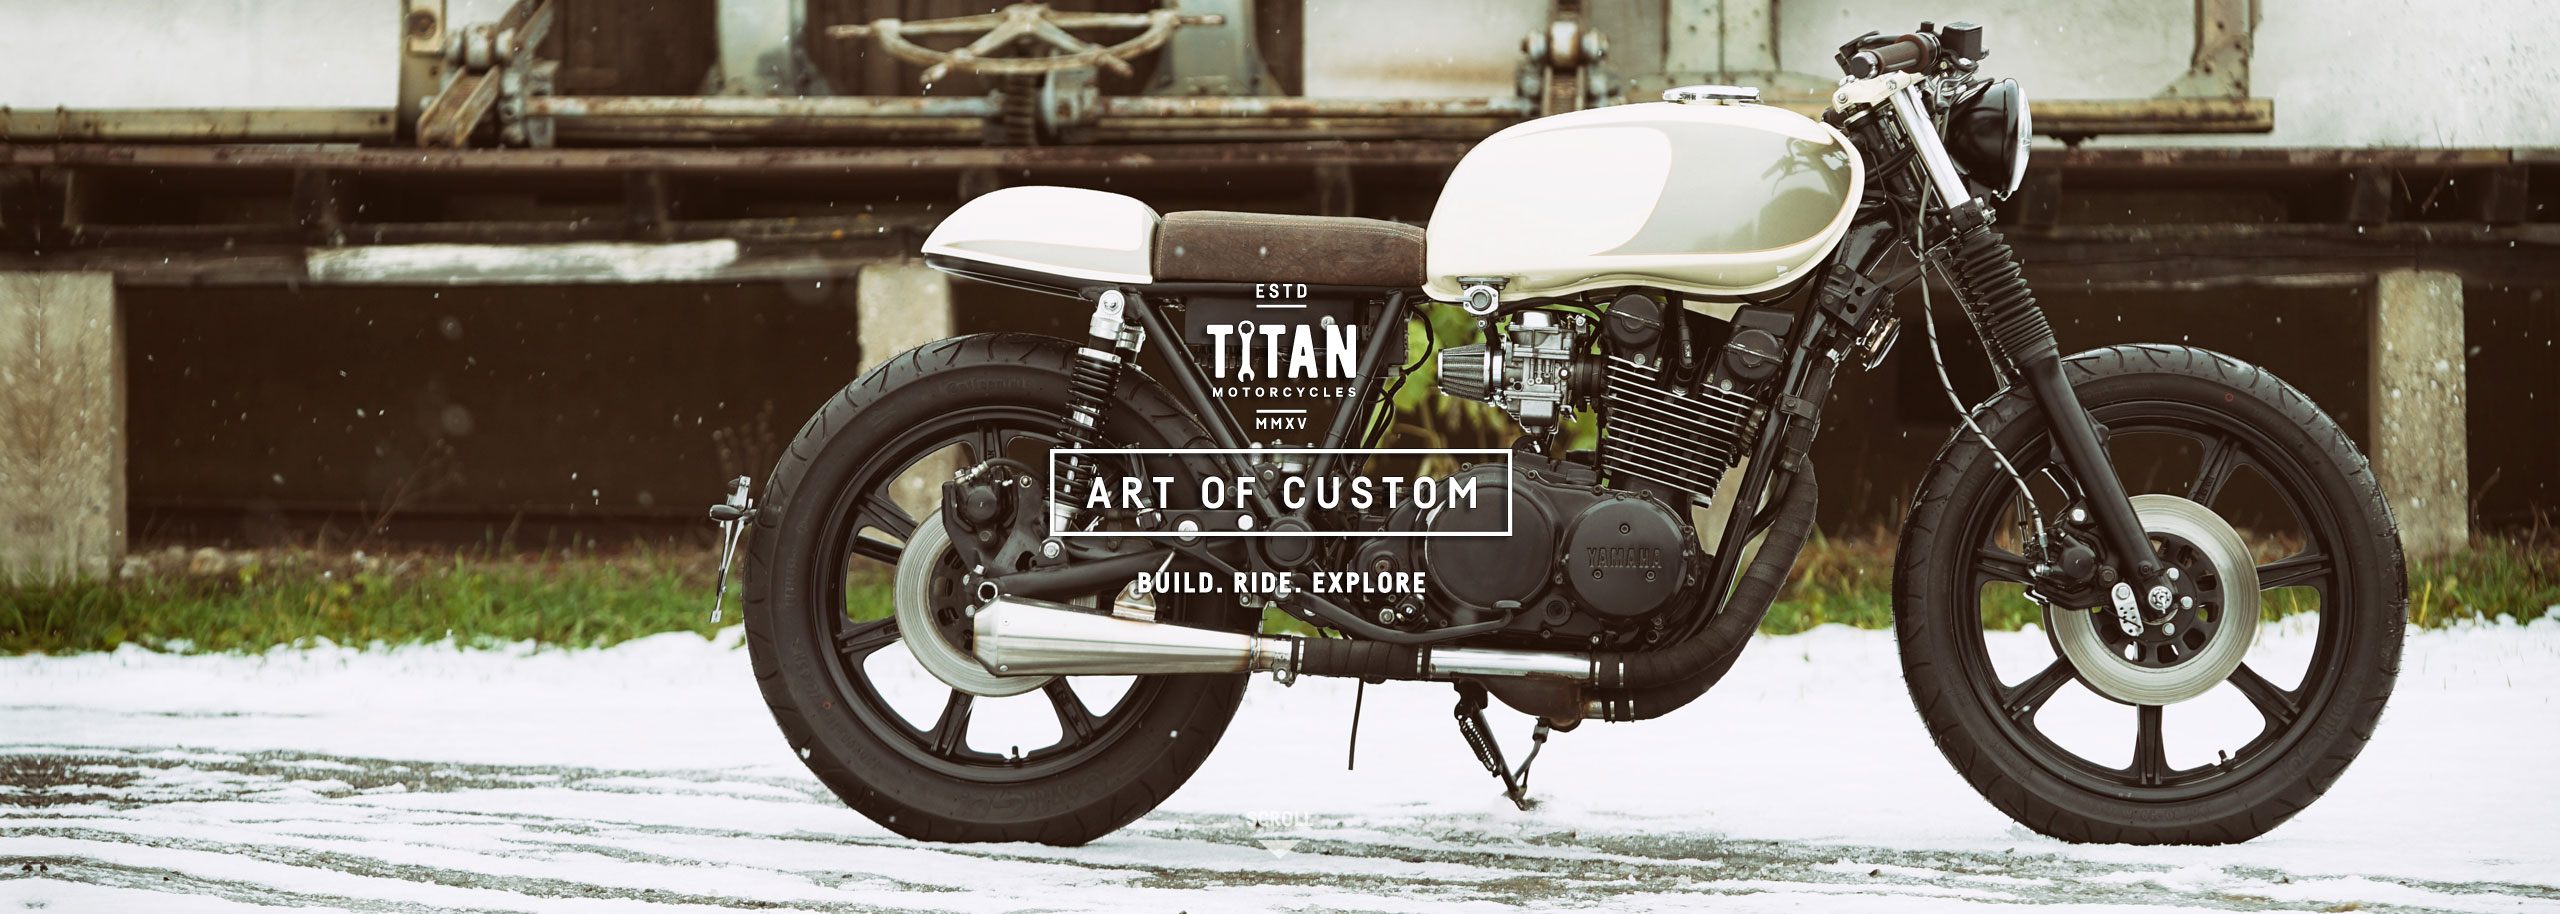 01_TITAN-Heavy-Metal_Honda-Umbau-XS-850_Cafe-Racer-Graz-Motorrad-Umbau-Austria-Vintage_Custom-Bikes-Sattel-Heck-Umbau